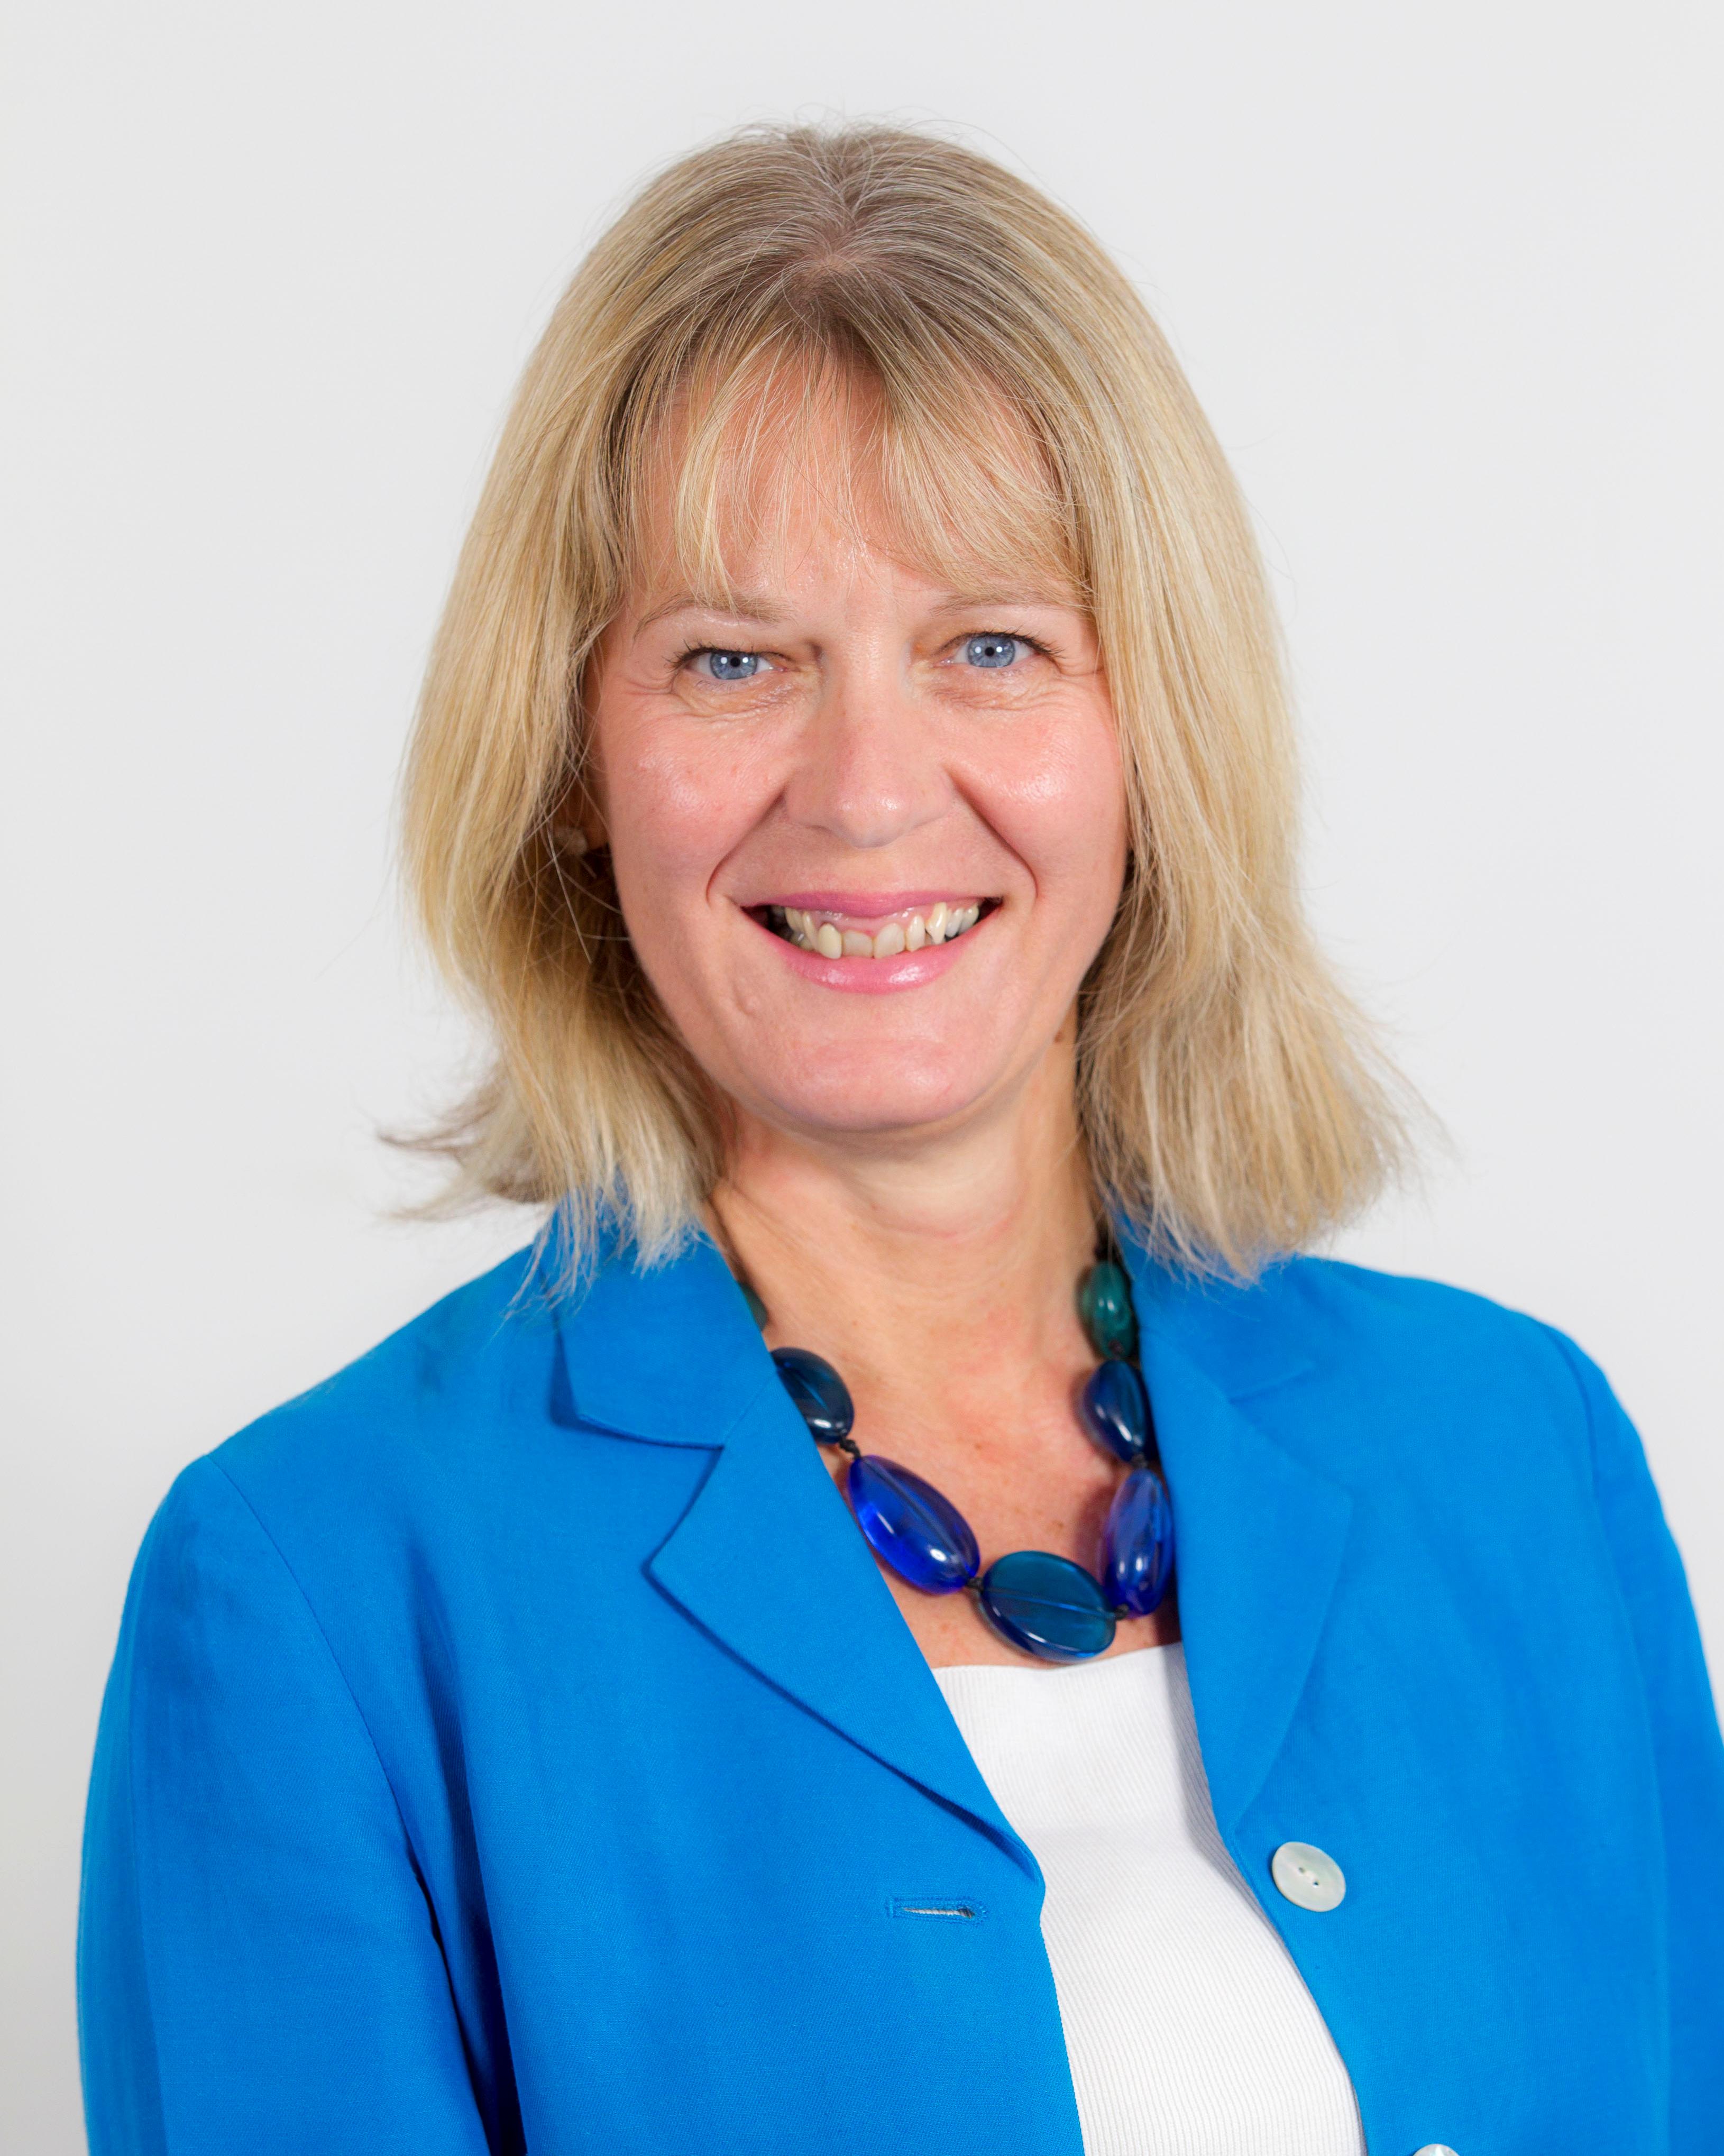 Linda Mitchell Partnerships and Development Manager